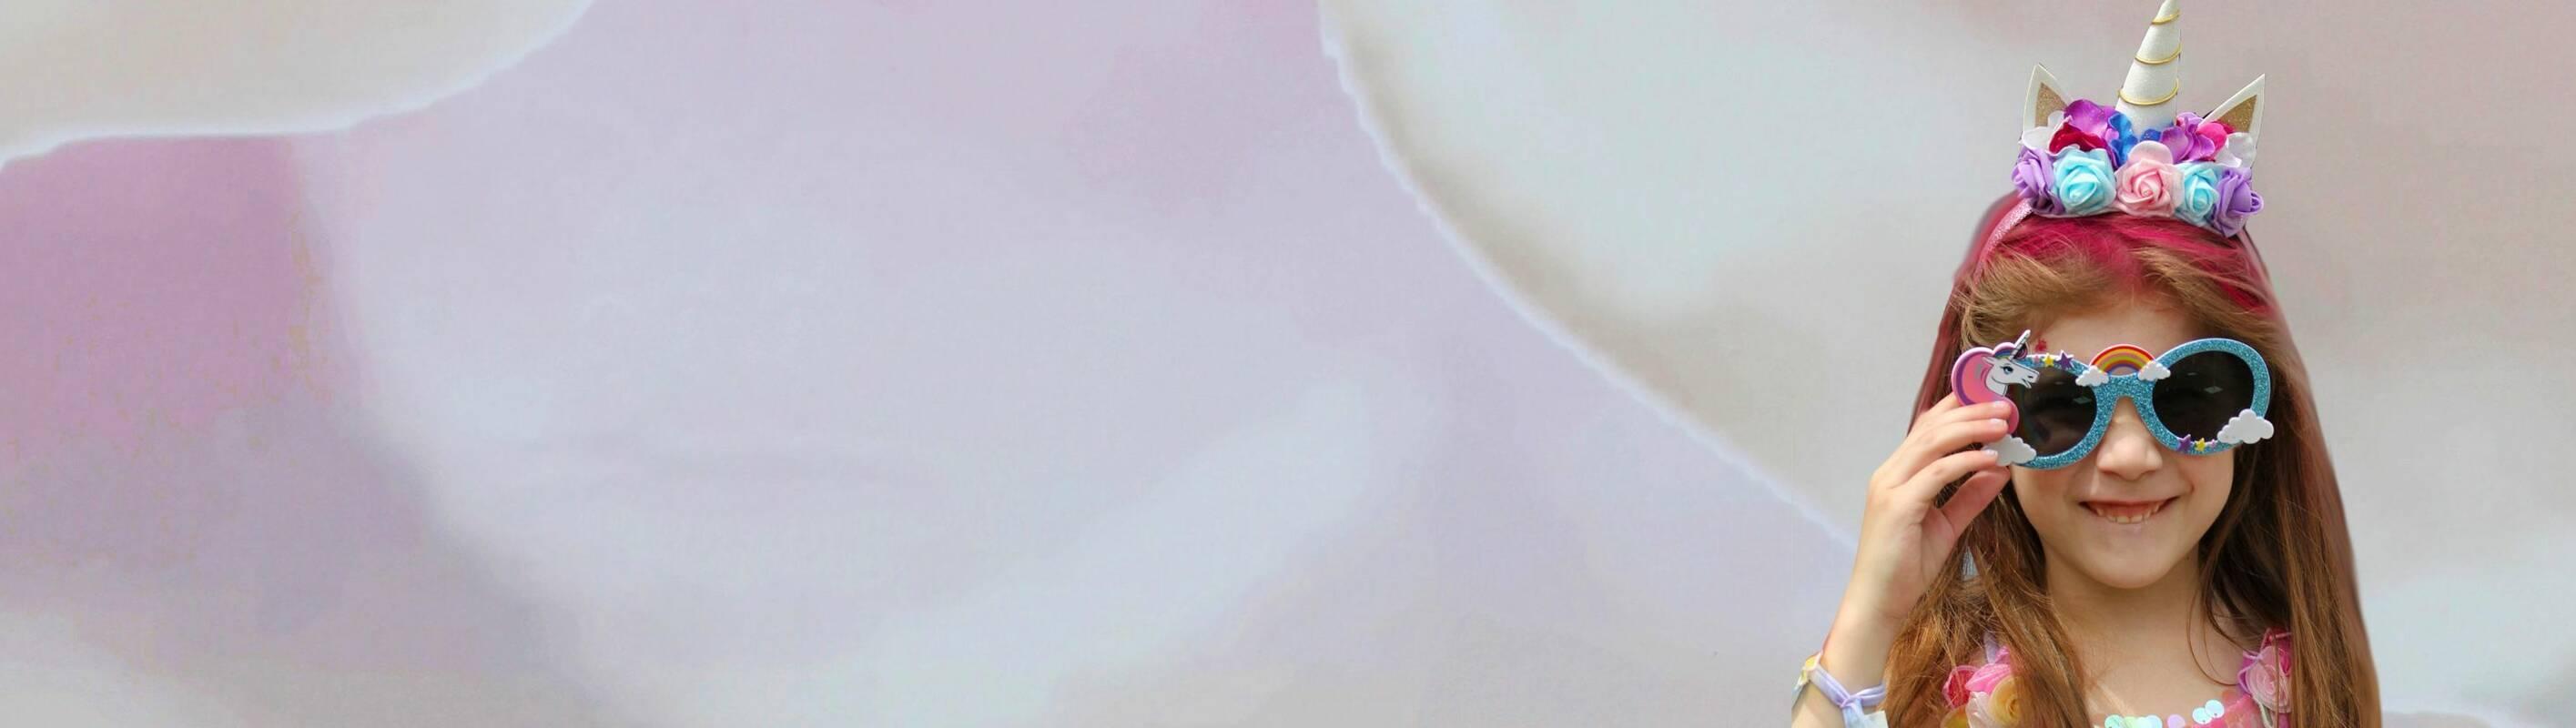 Make A Wish Australia, Children's Charity - Abigail on her wish wearing a unicorn headband and glasses